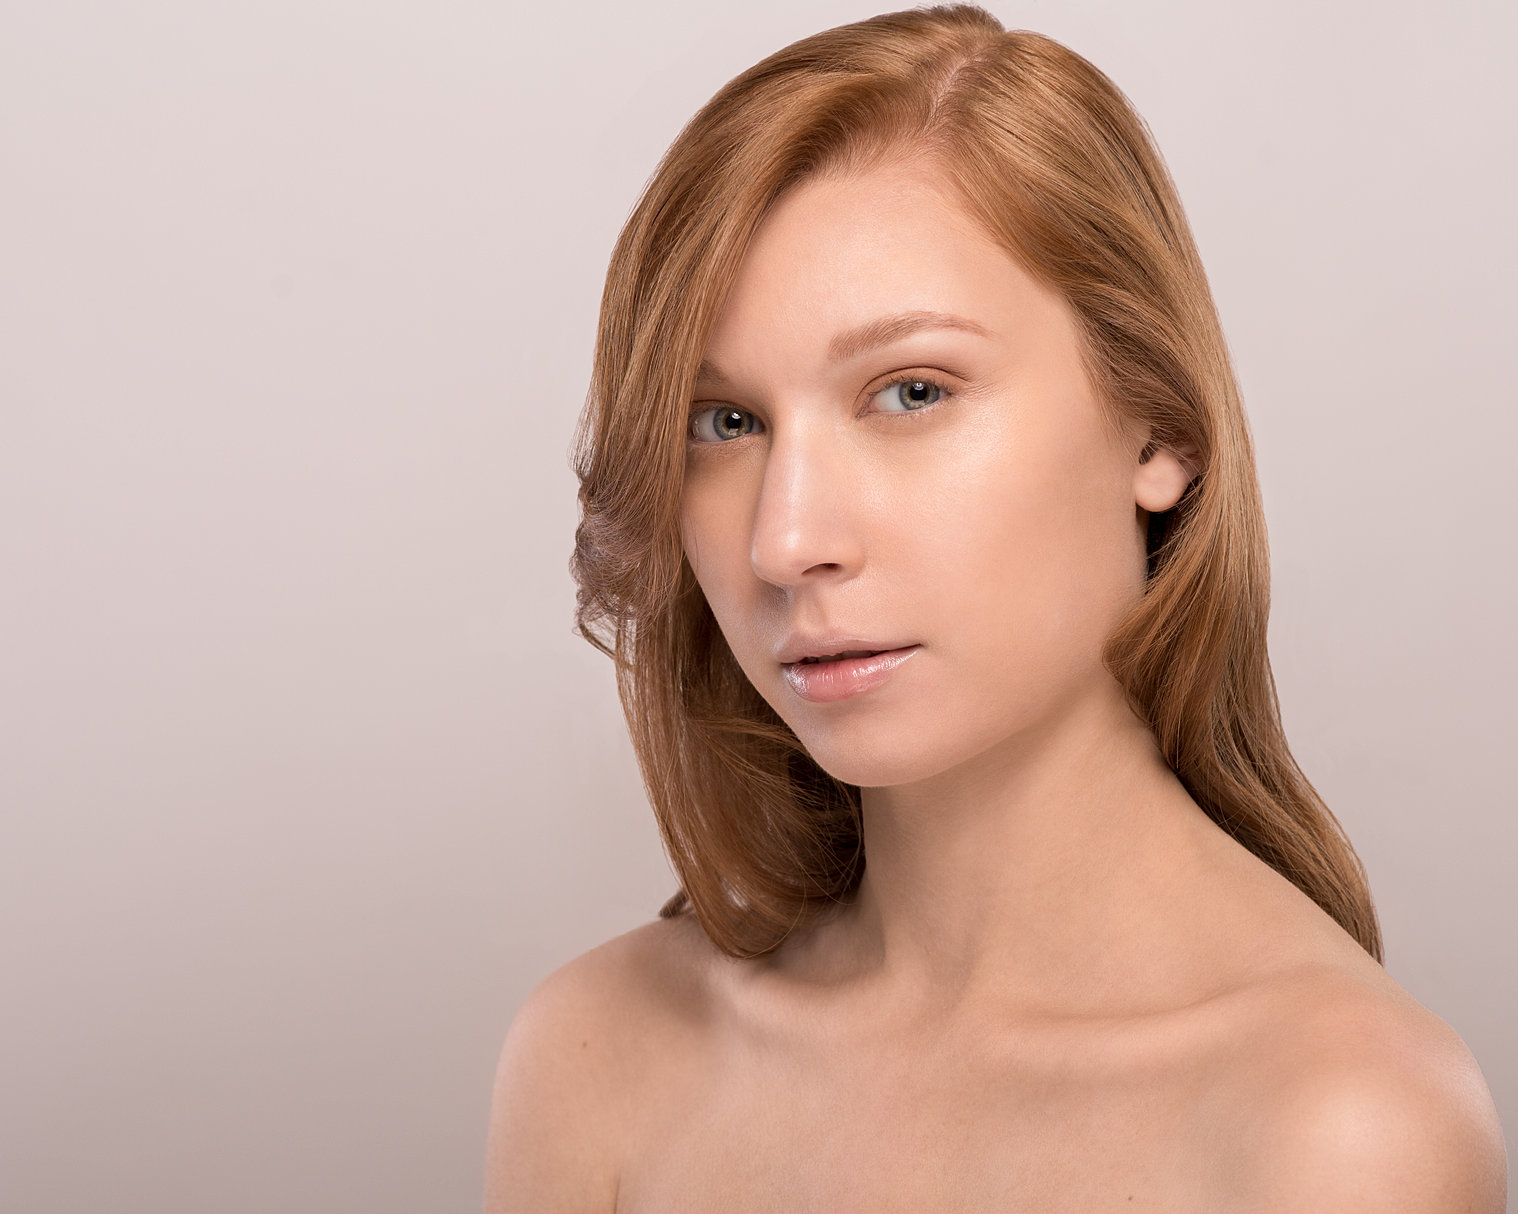 tennia williams hair stylist makeup artist beauty advisor 2010 by tennia wlliams